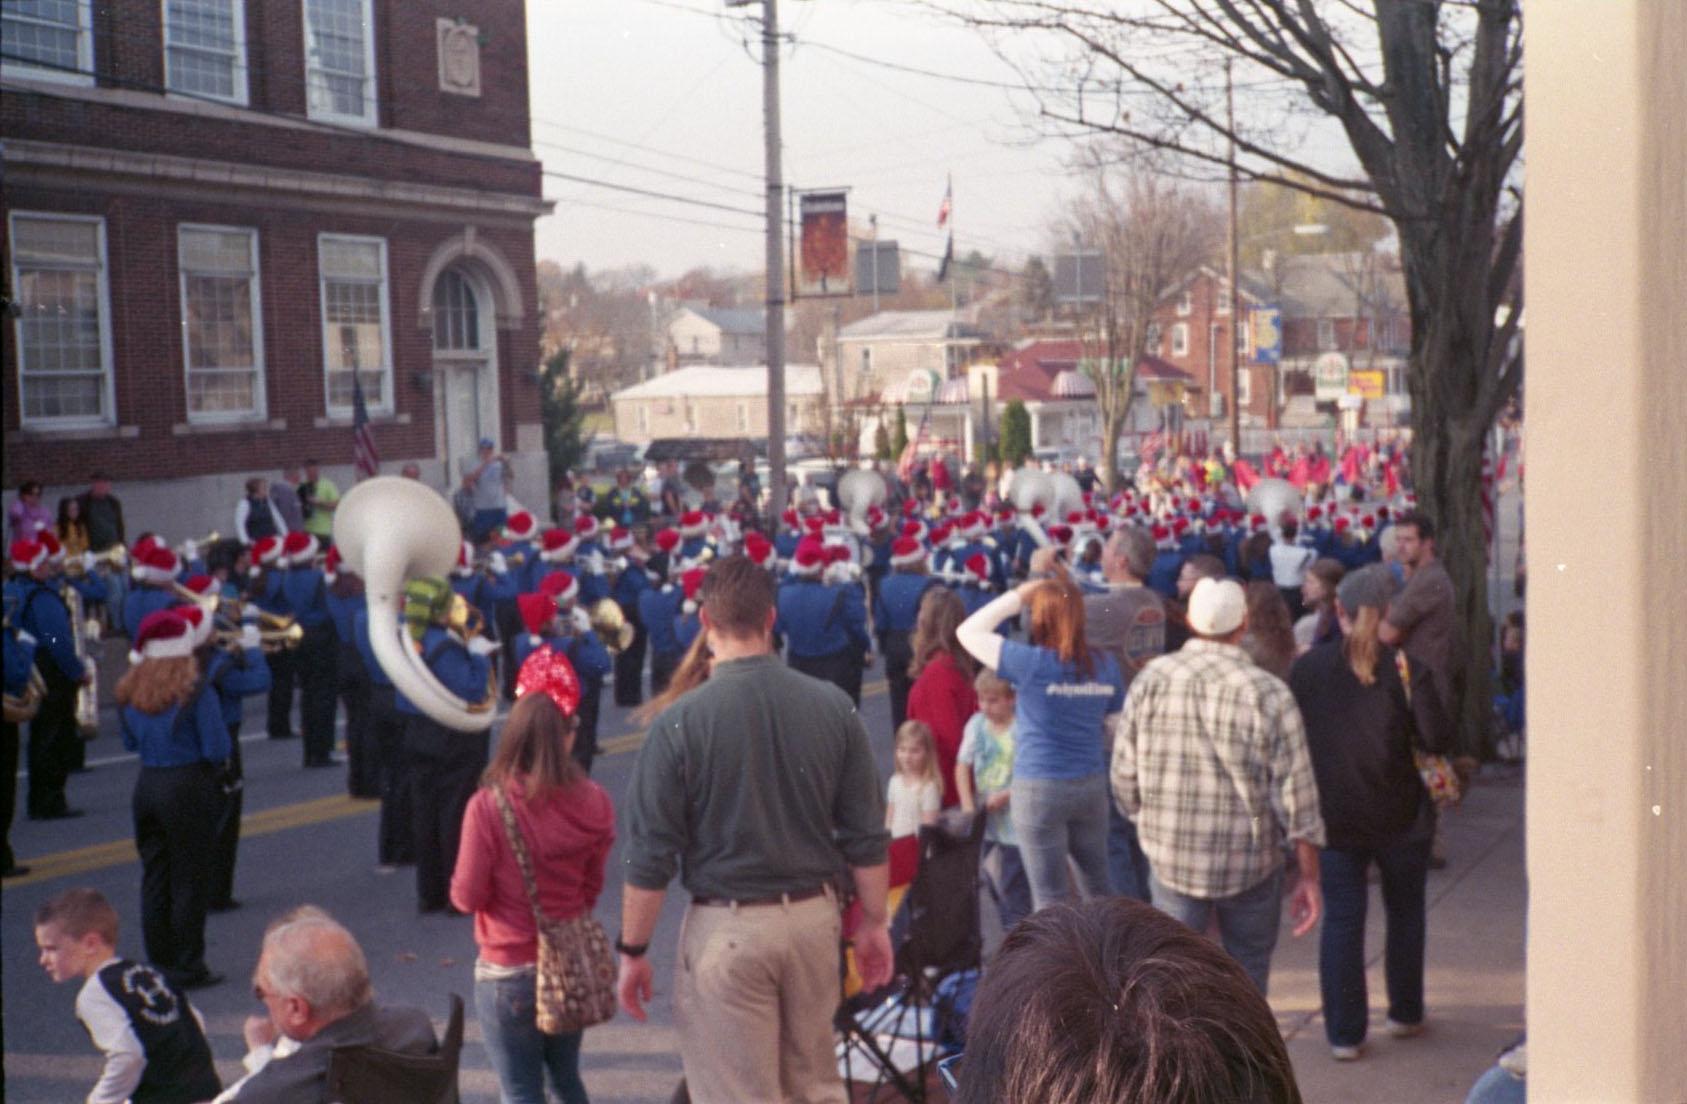 marching_band_30882029060_o.jpg